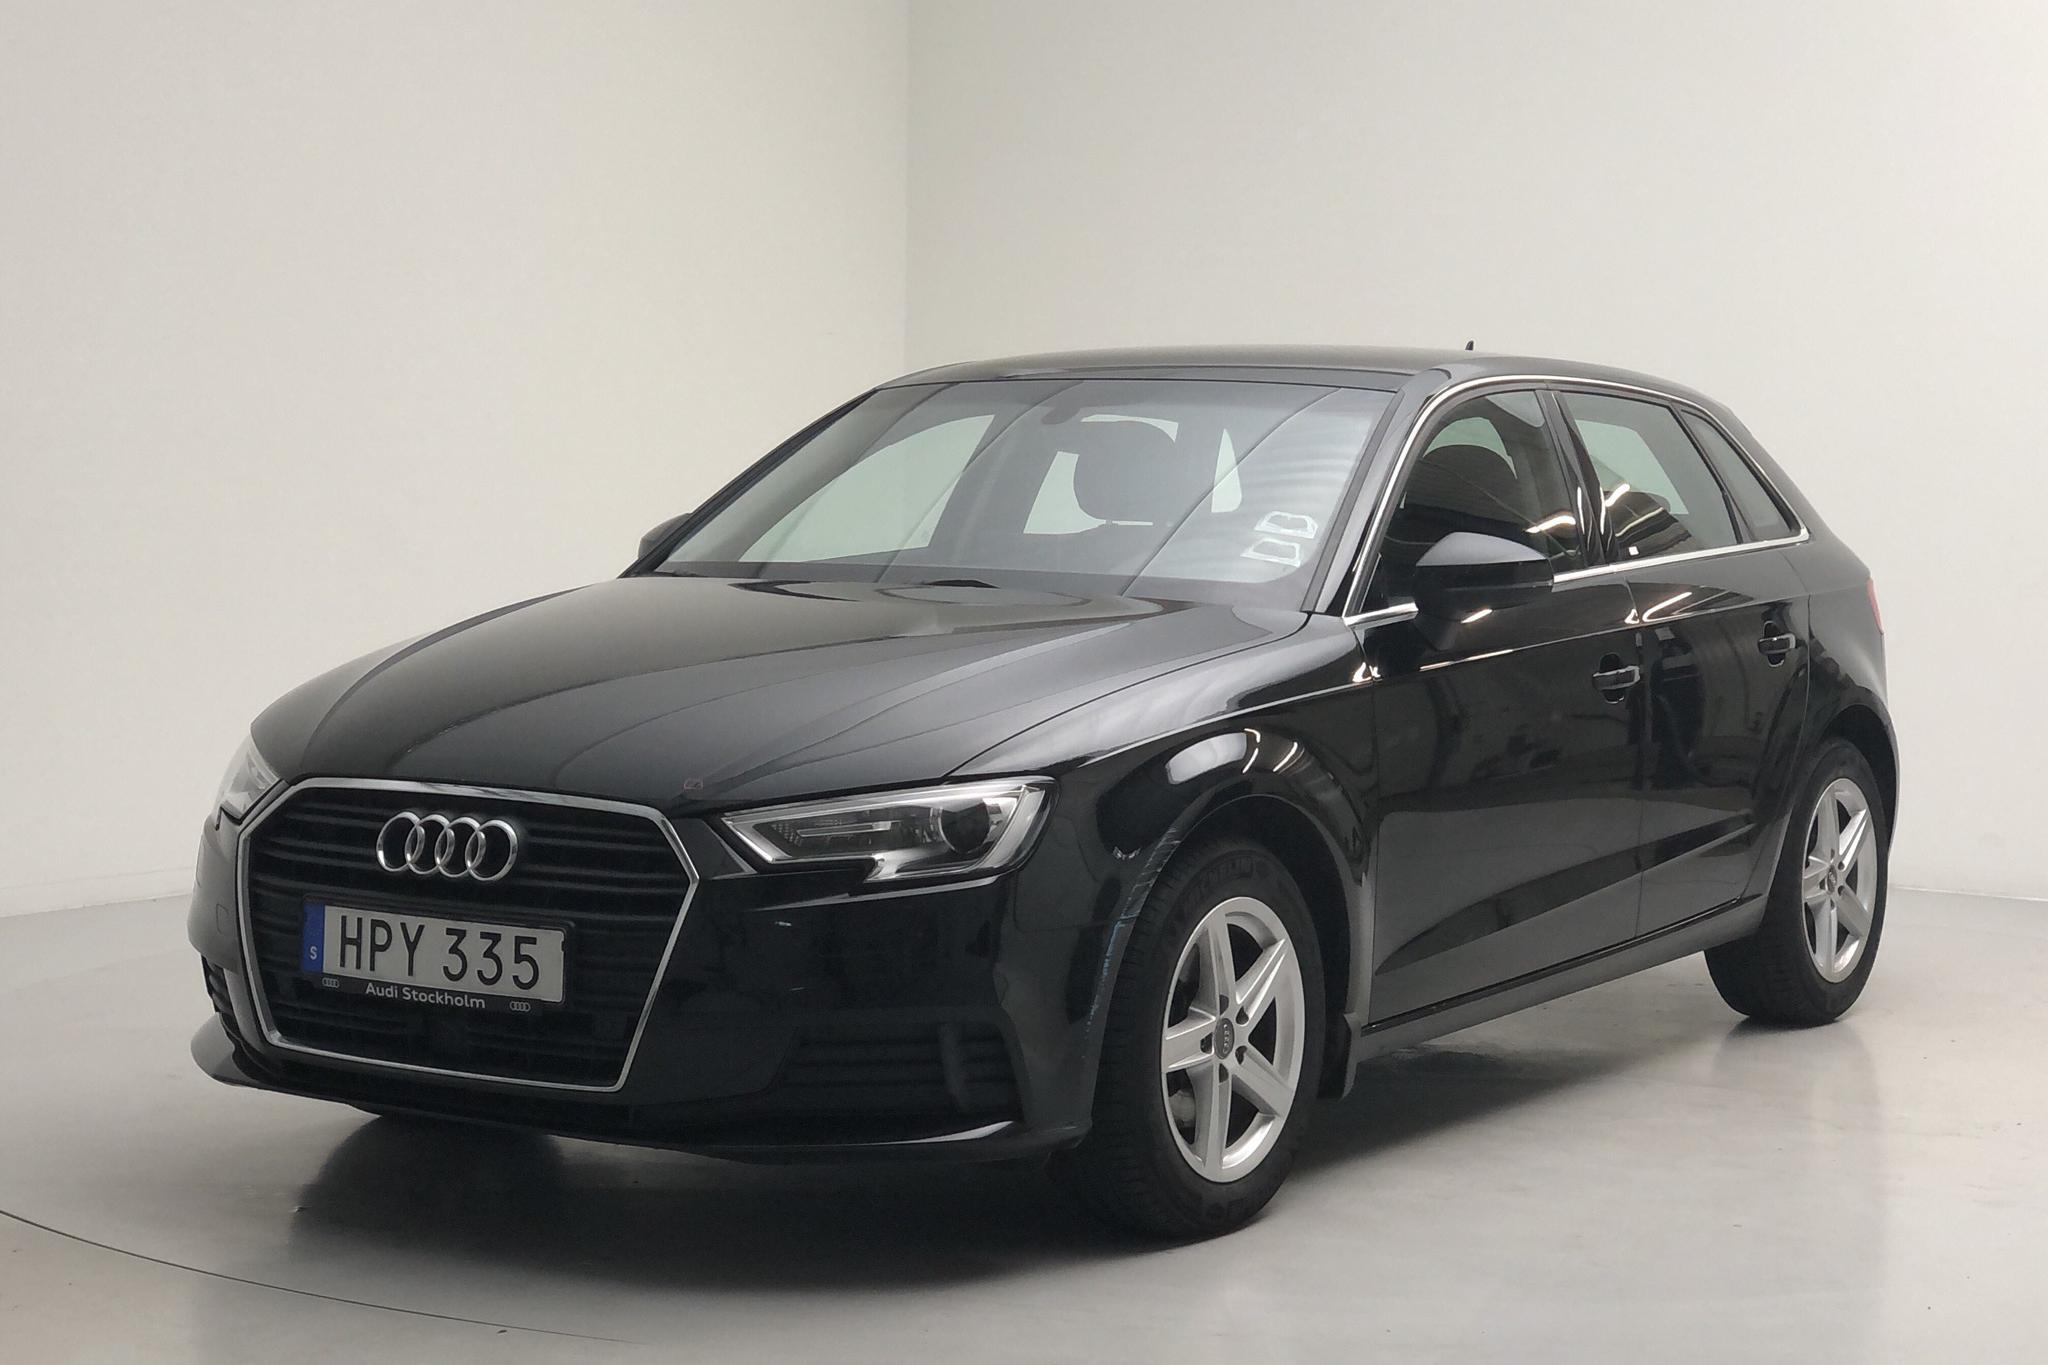 Audi A3 1.6 TDI Sportback (116hk) - 62 170 km - Automatic - black - 2018